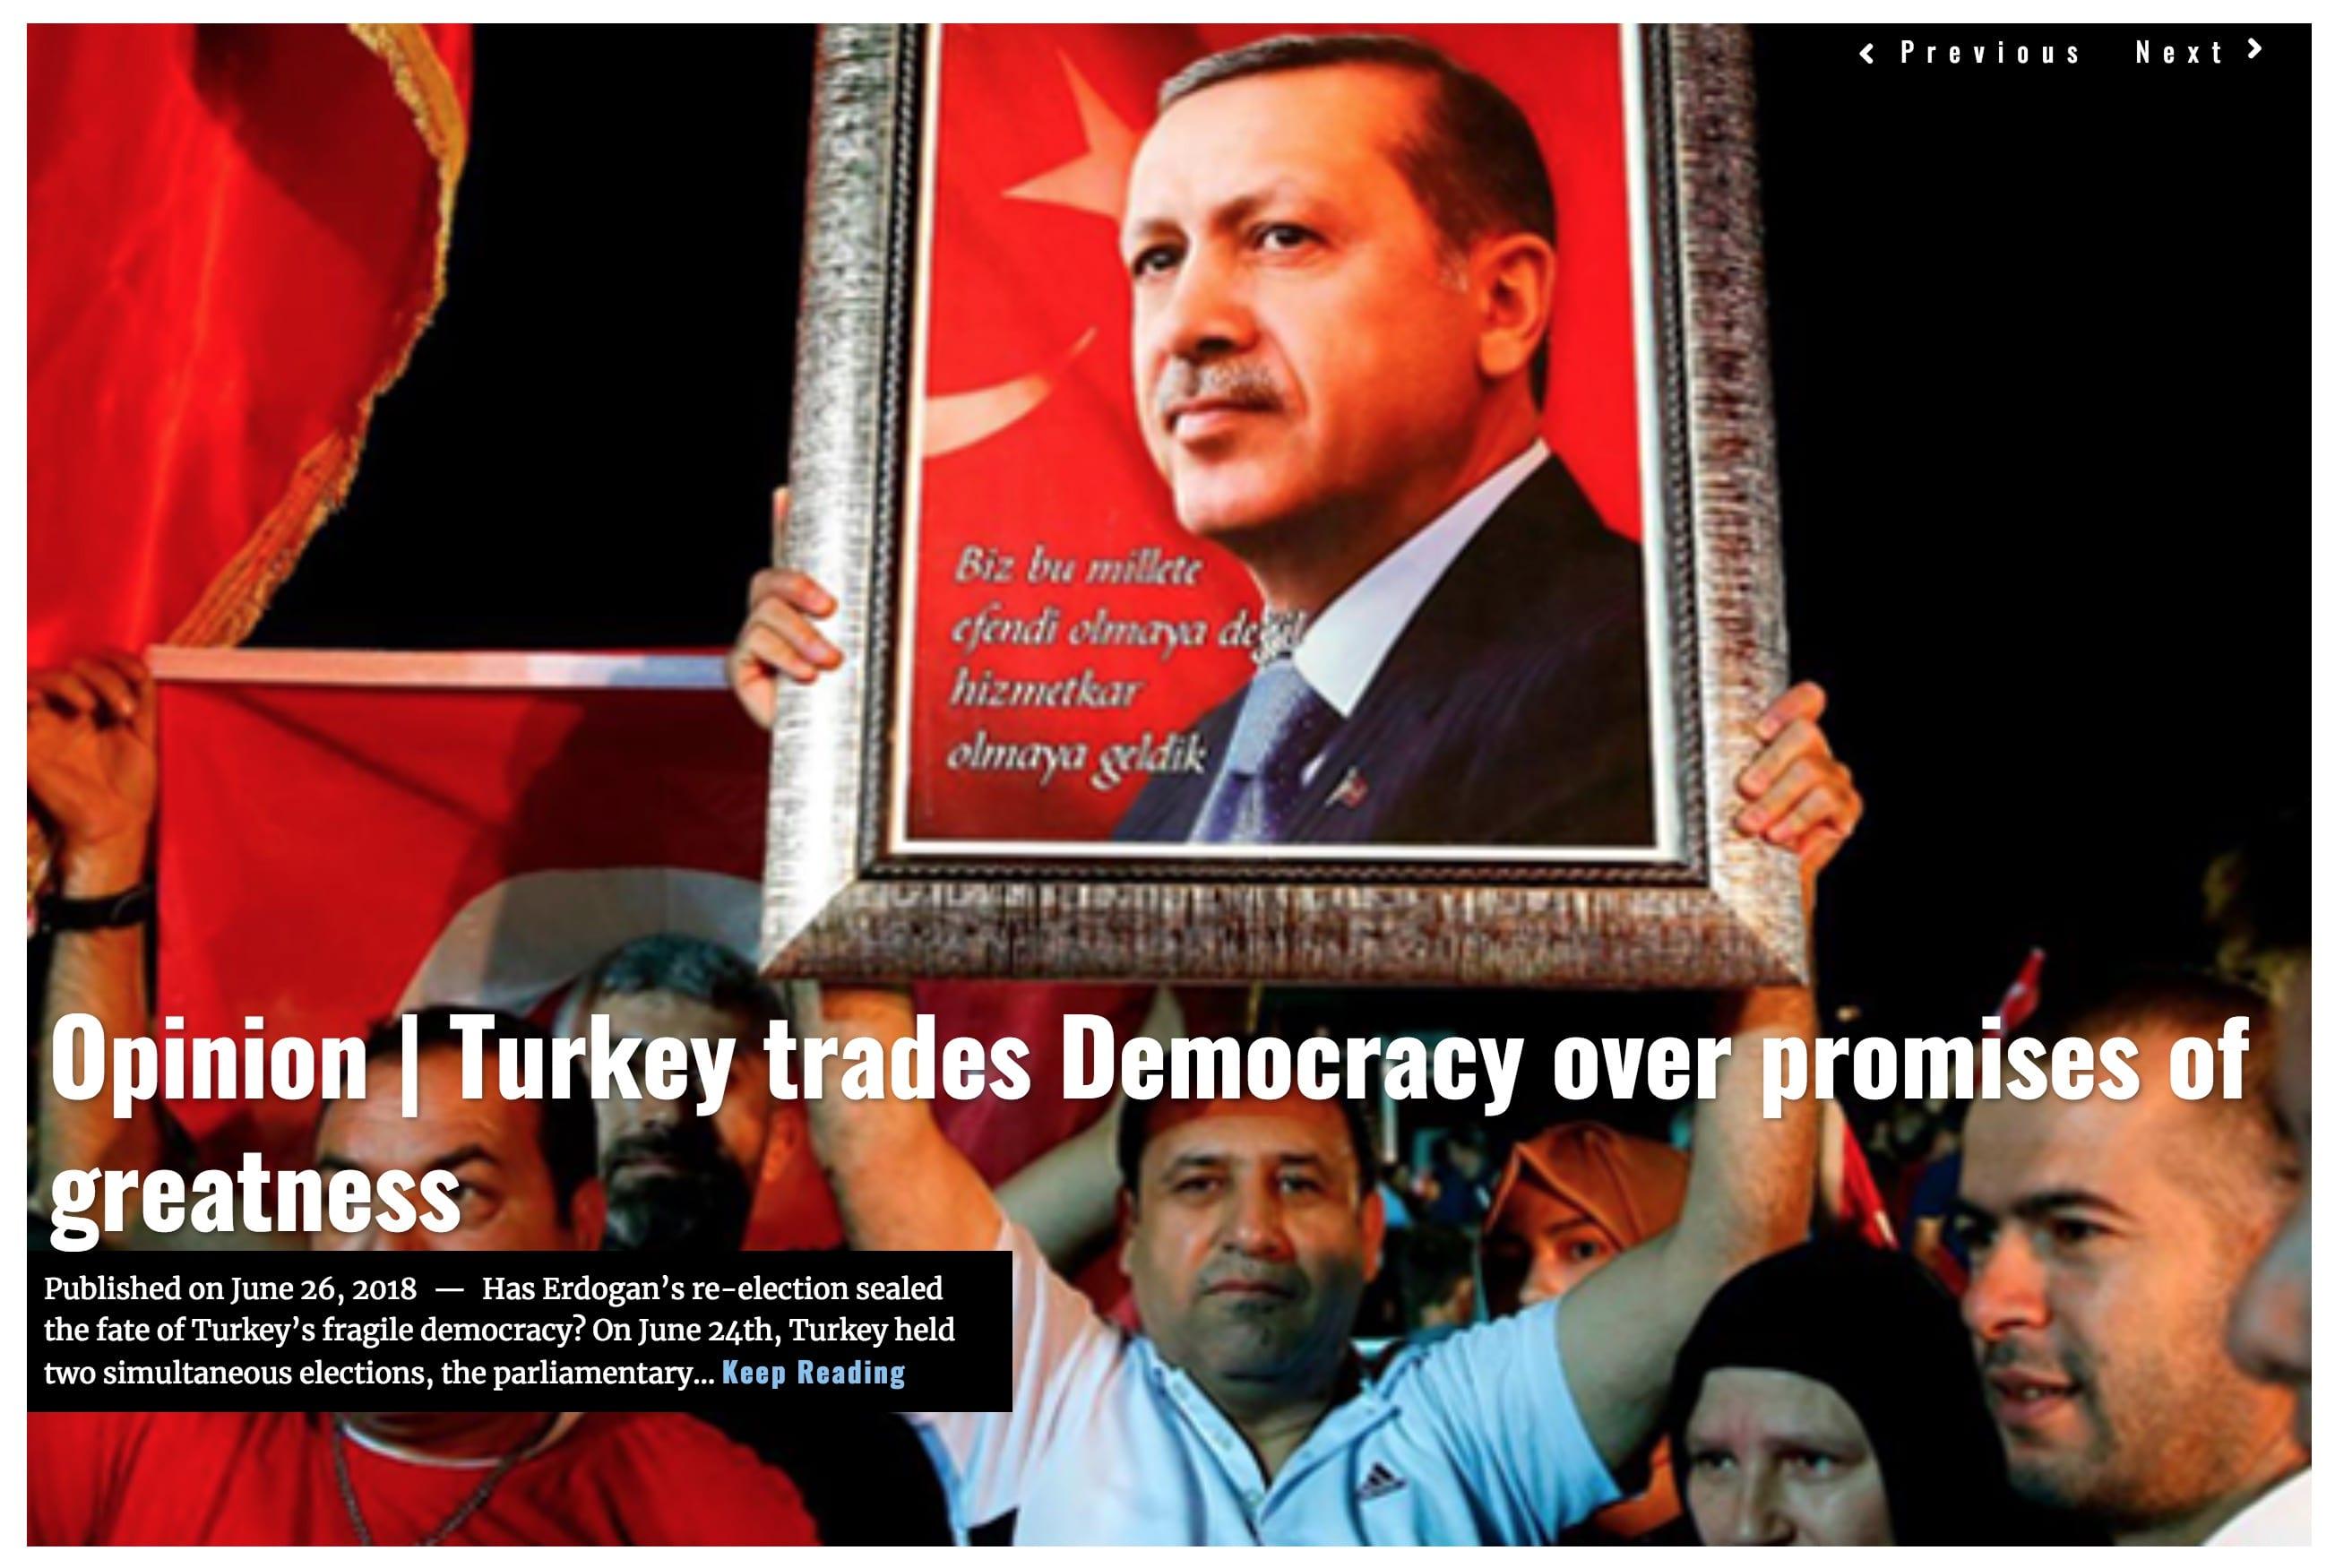 Image Lima Charlie News Headline Turkey Trades Democracy JUN 26 2018